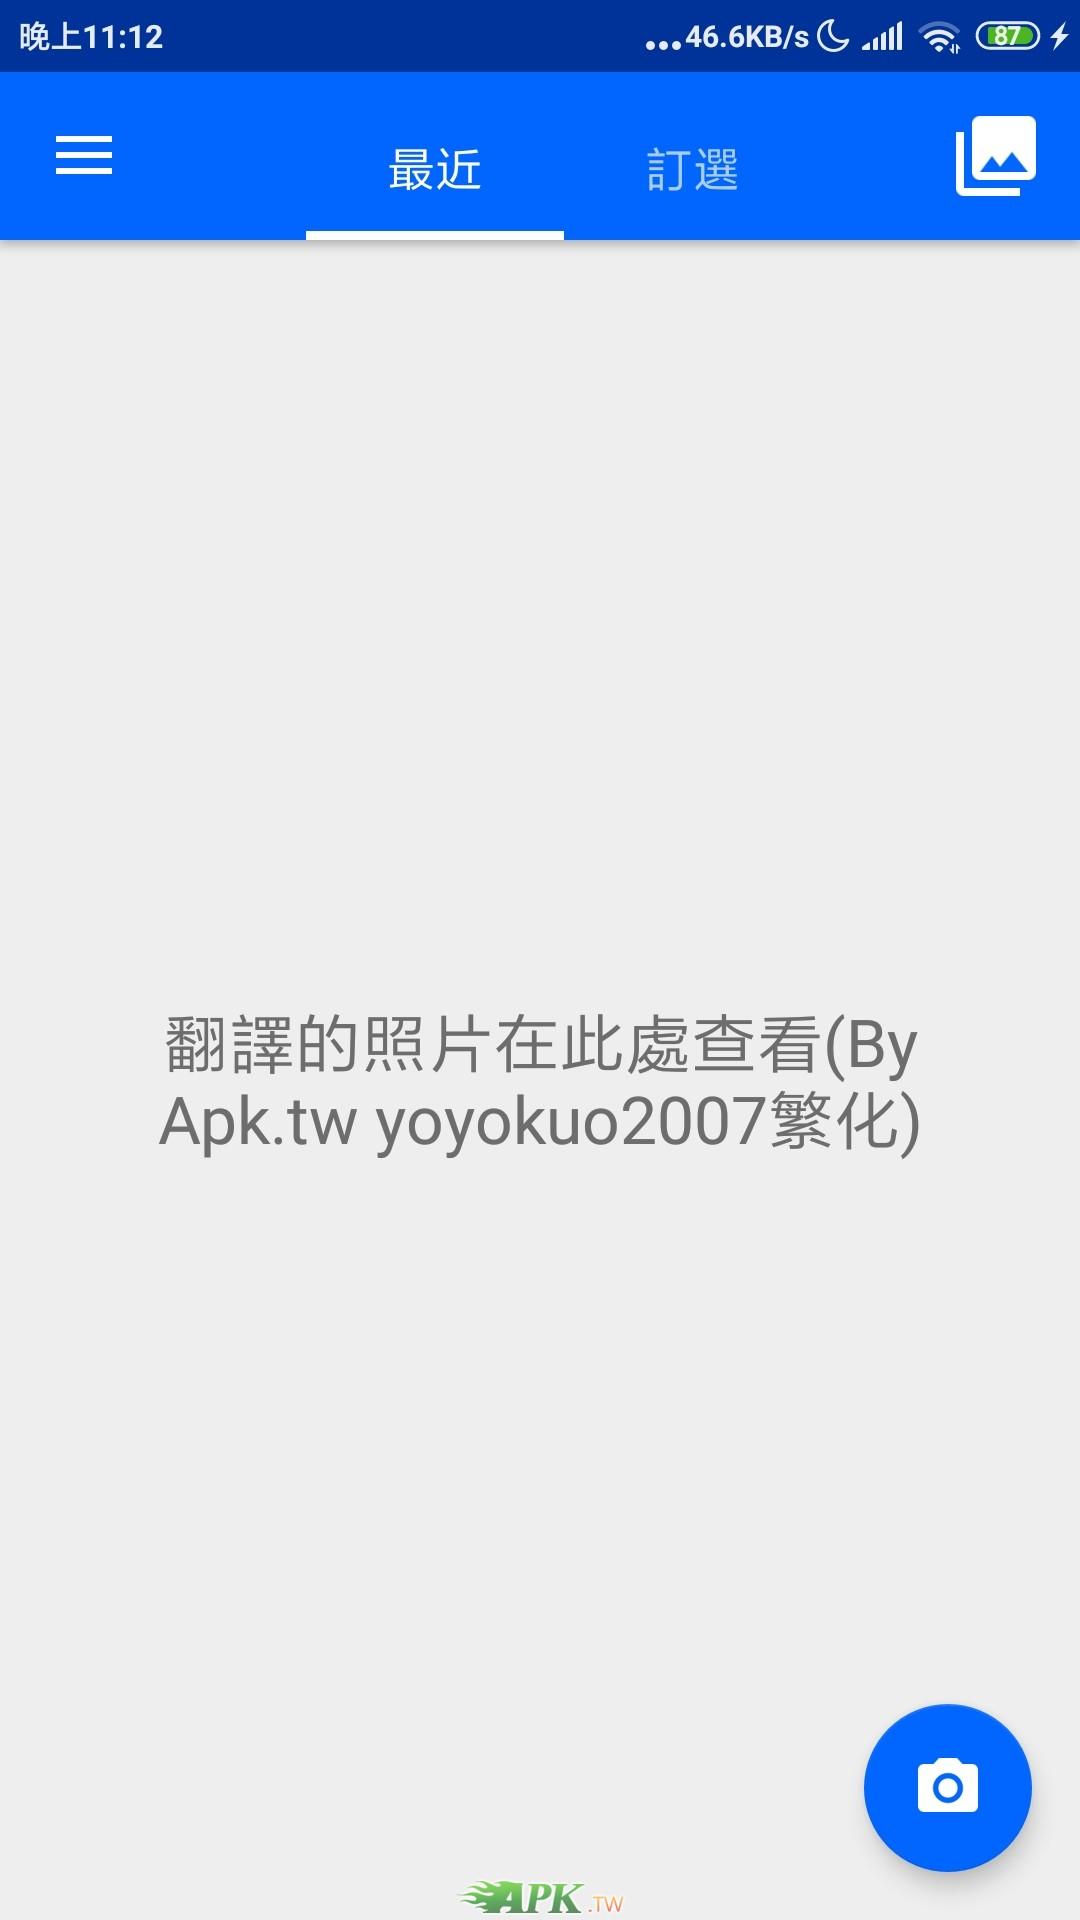 Screenshot_2020-08-17-23-12-11-560_xbean.image.picture.translate.ocr.jpg